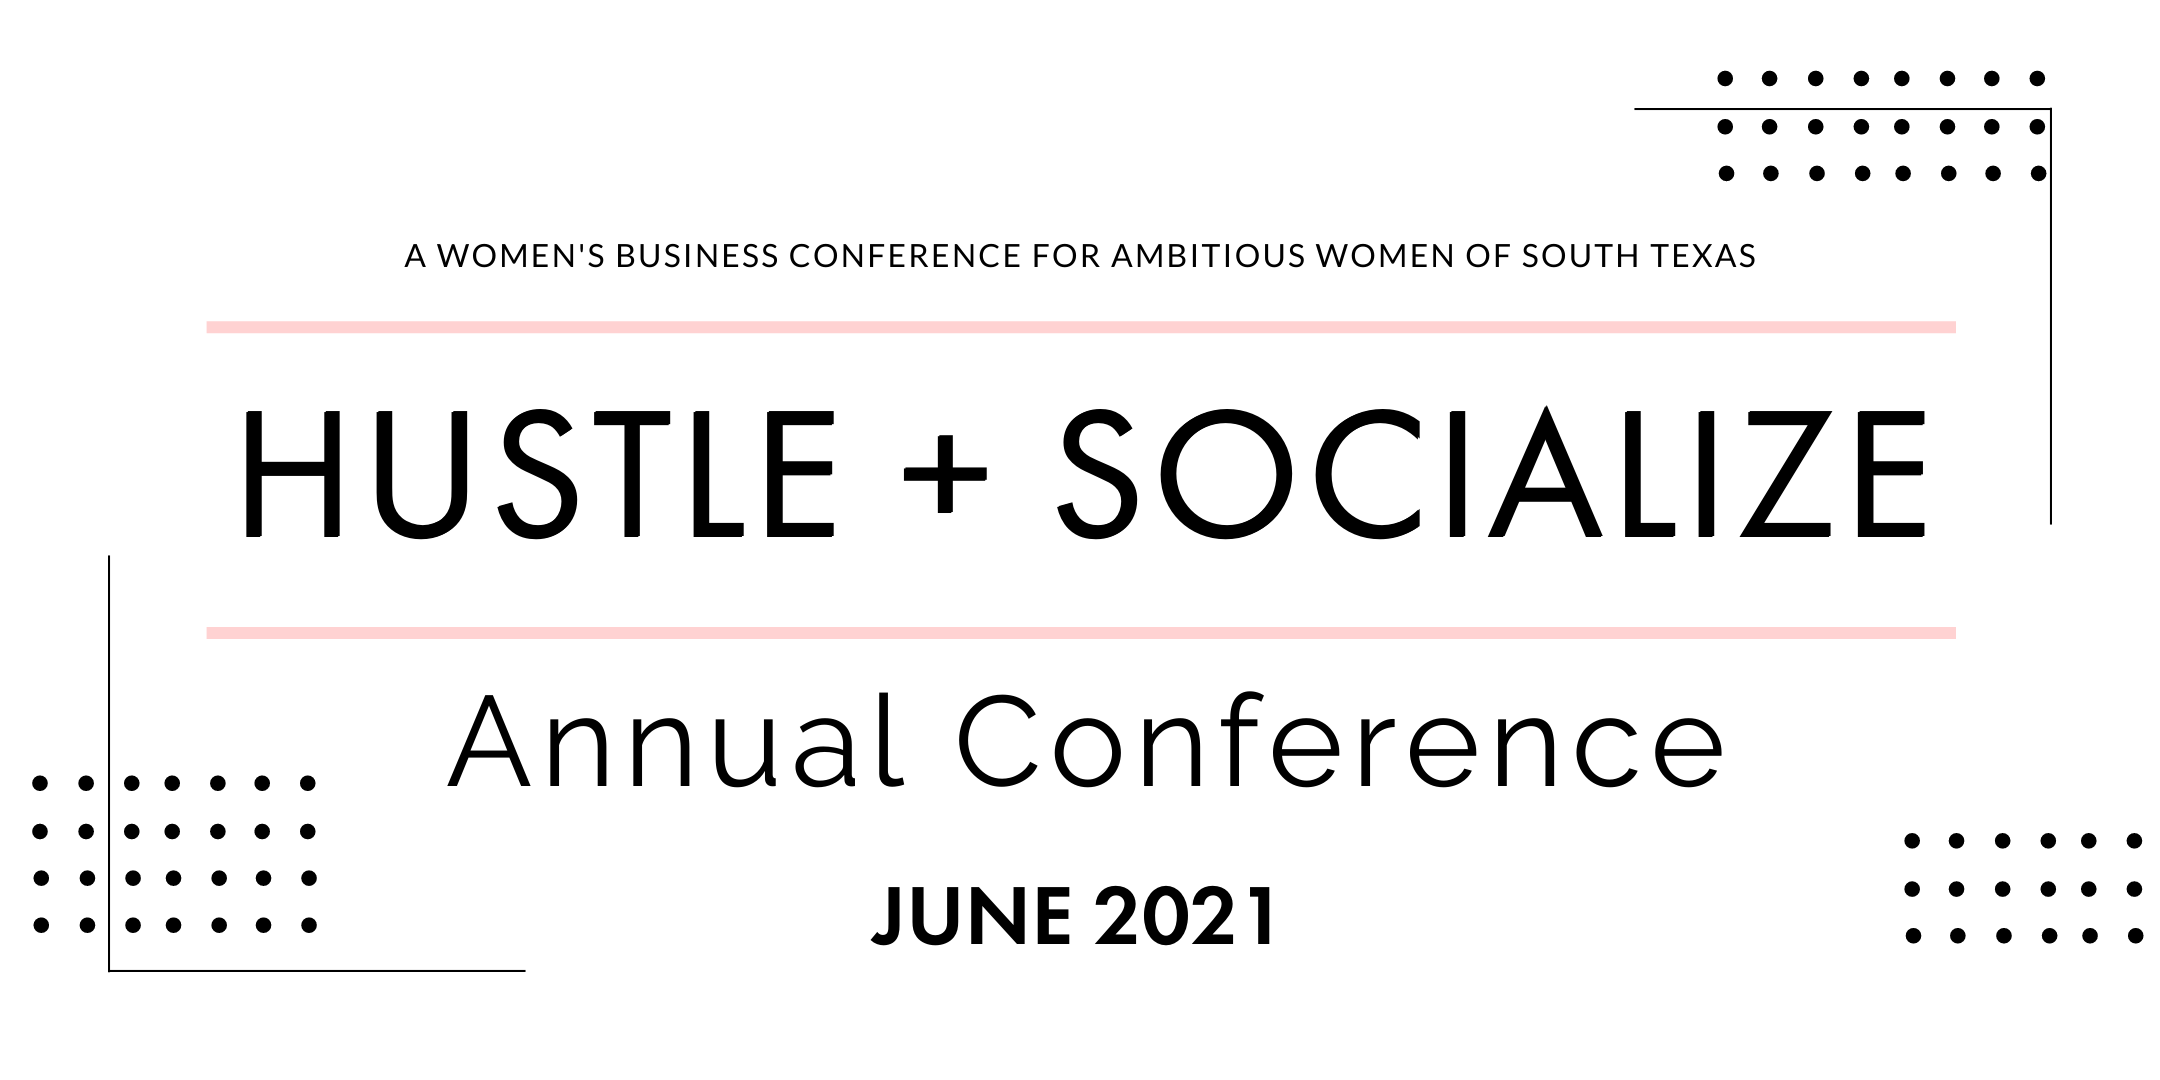 Hustle + Socialize 2021